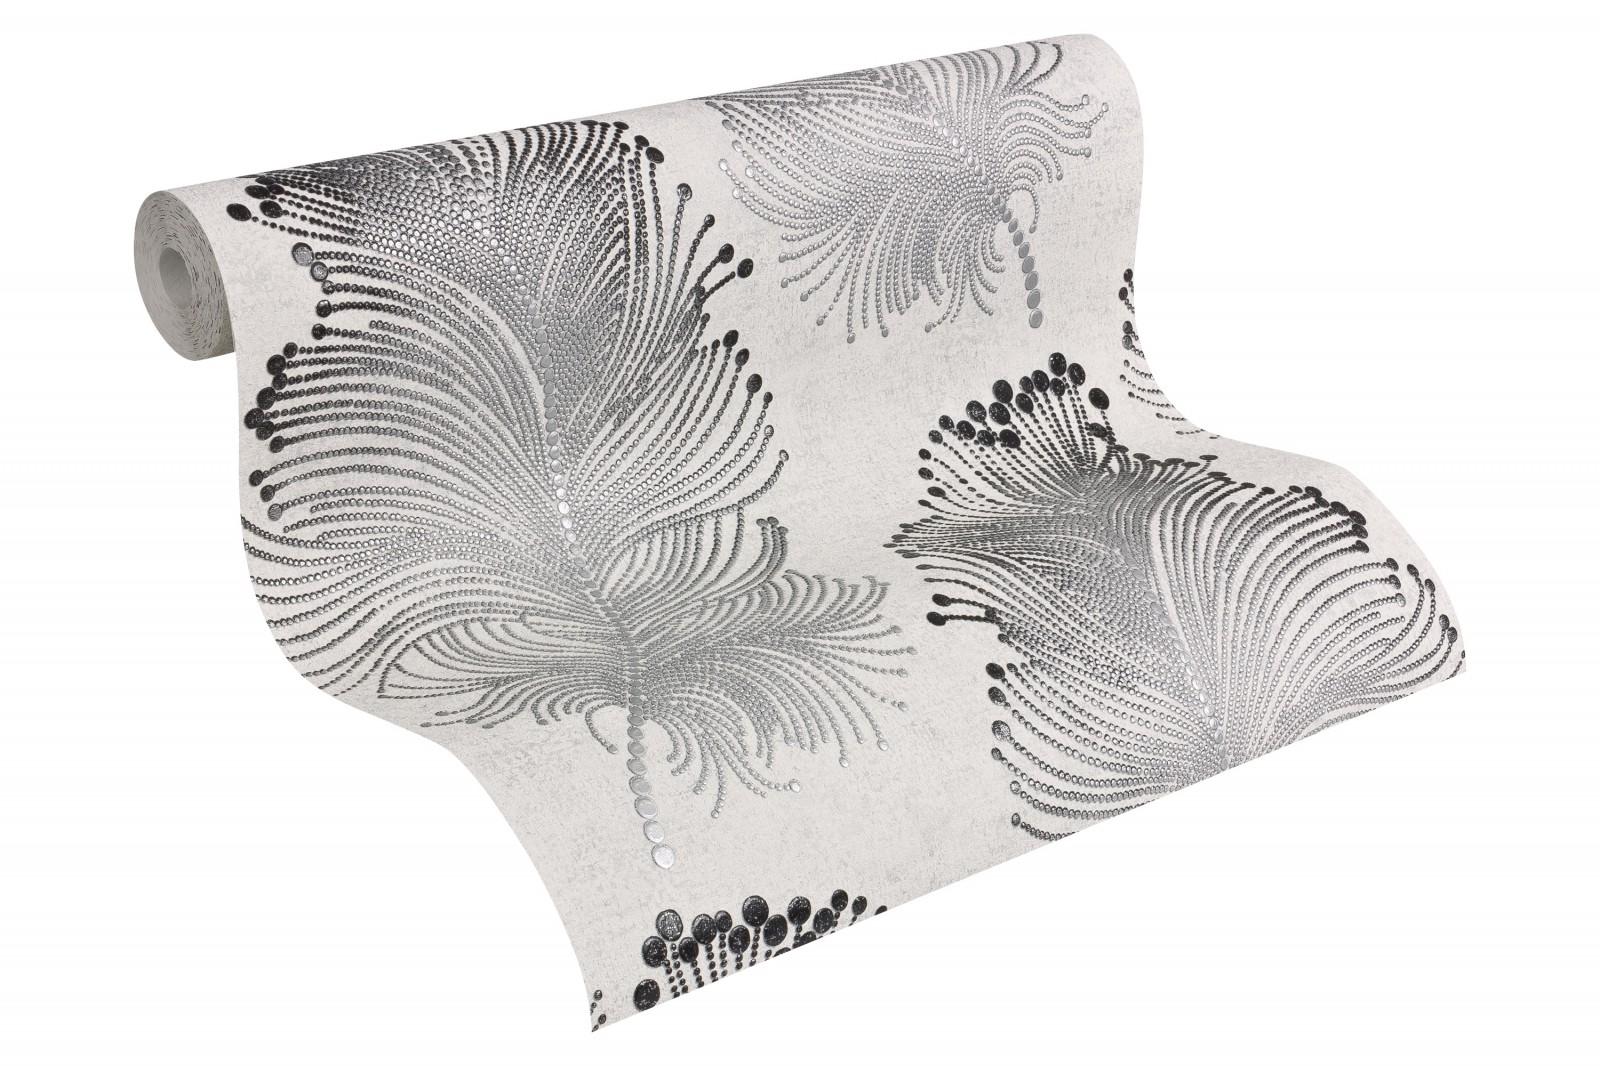 vliestapete grau silber natur livingwalls 96045 6. Black Bedroom Furniture Sets. Home Design Ideas